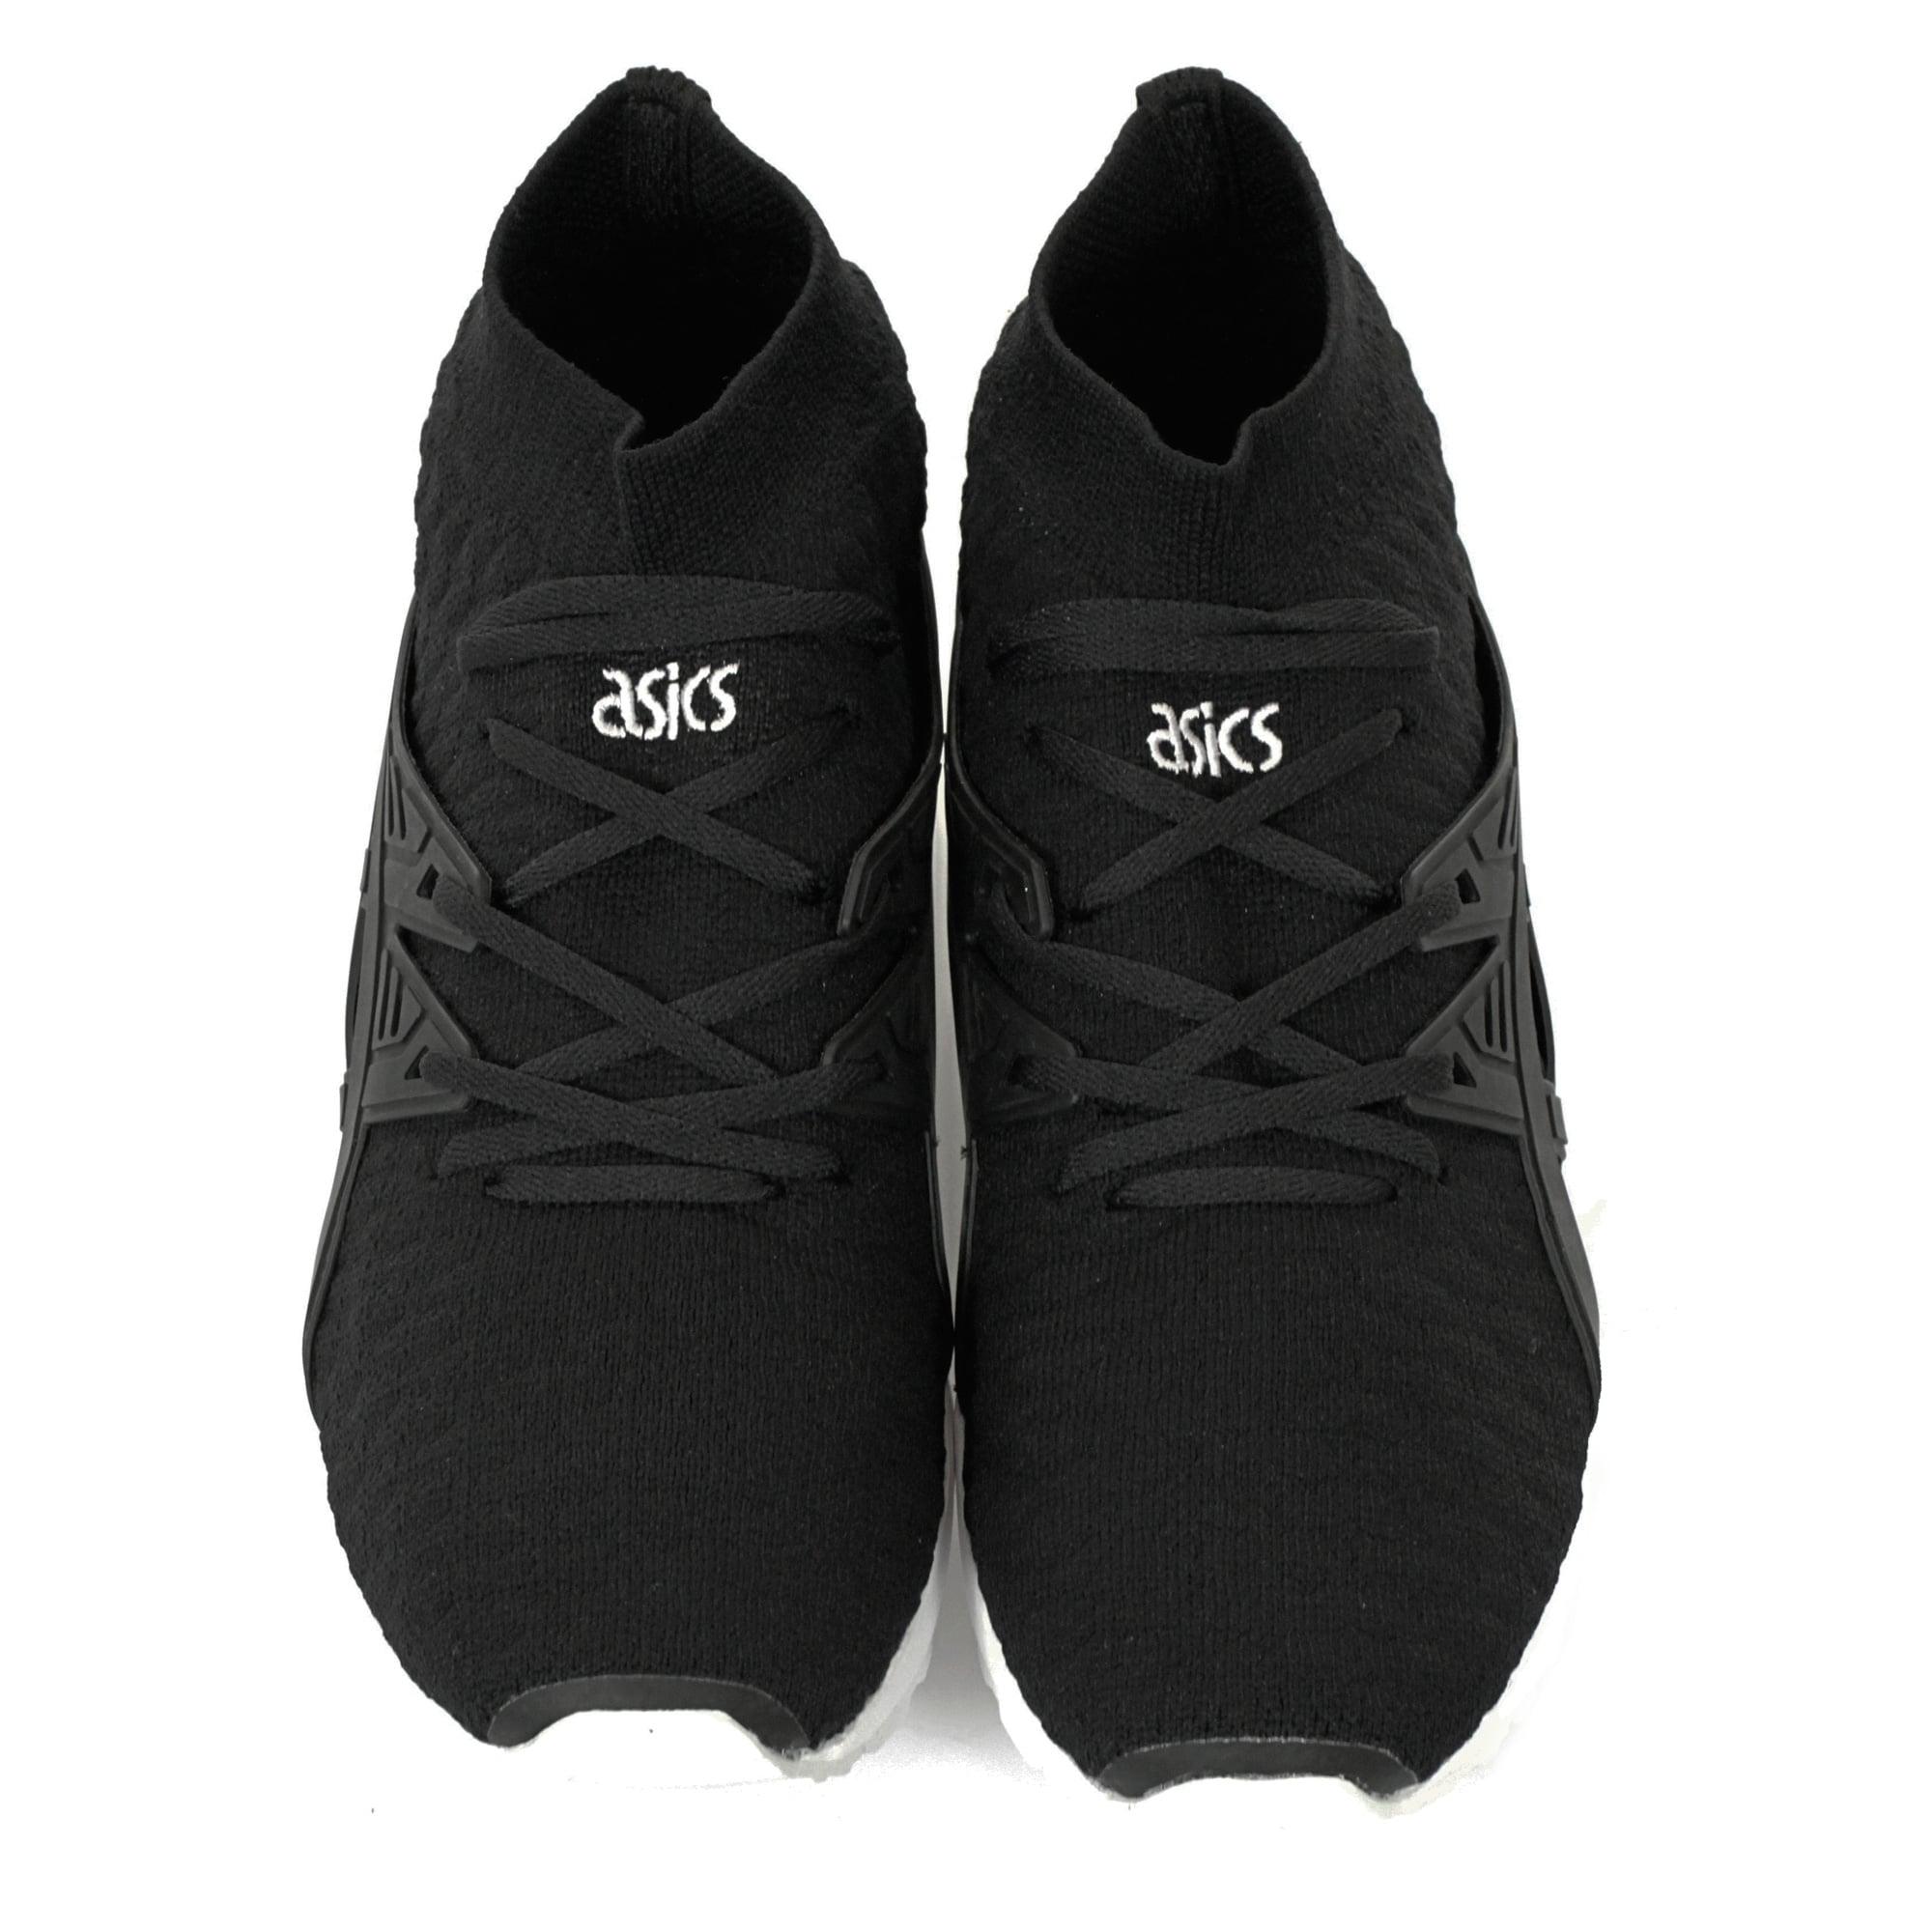 best service 9d020 7bb6e Asics Asics Gel-Kayano Knit Black Shoe H7P4N 9090